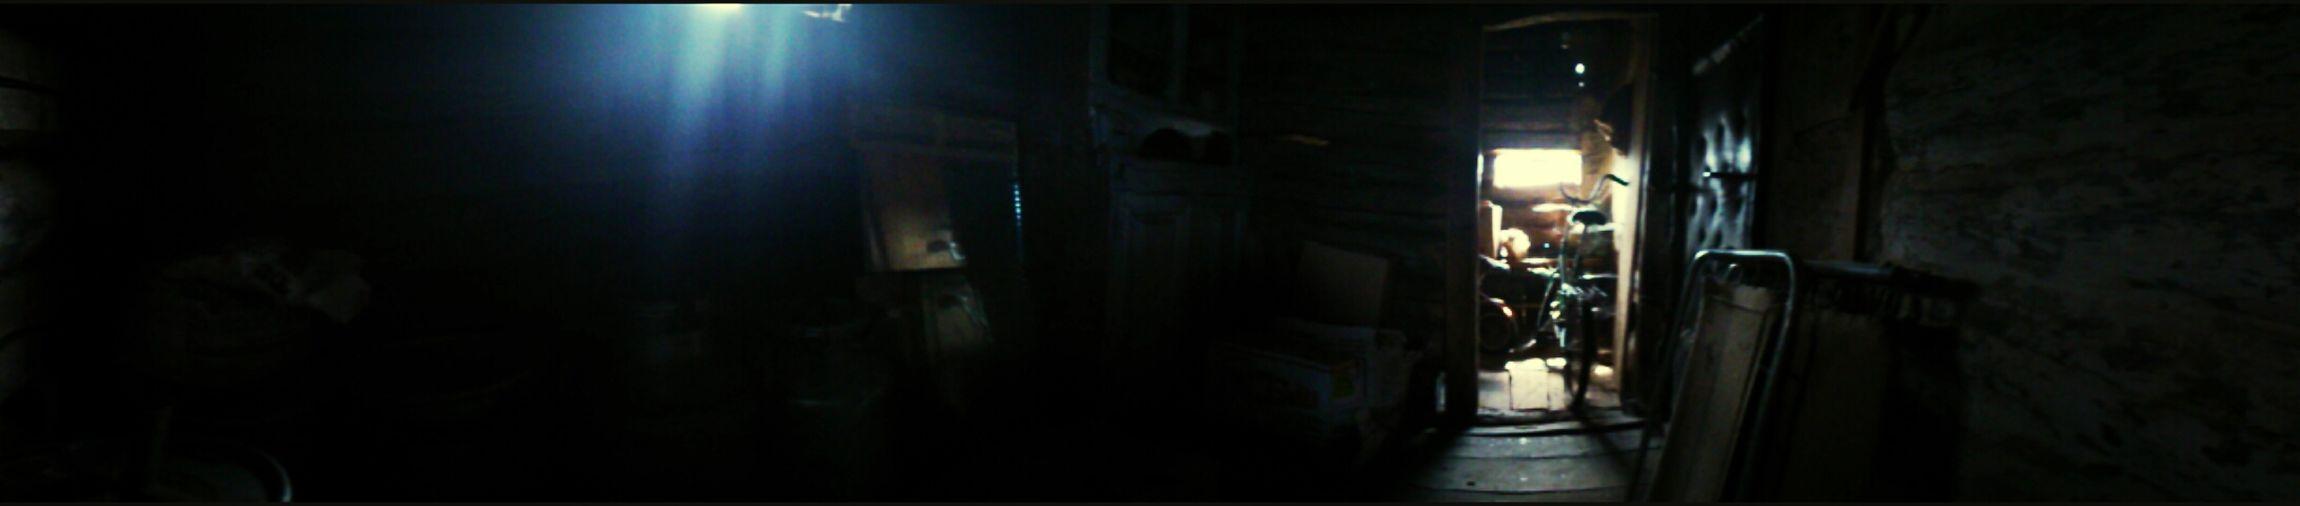 Old House Thriller Room